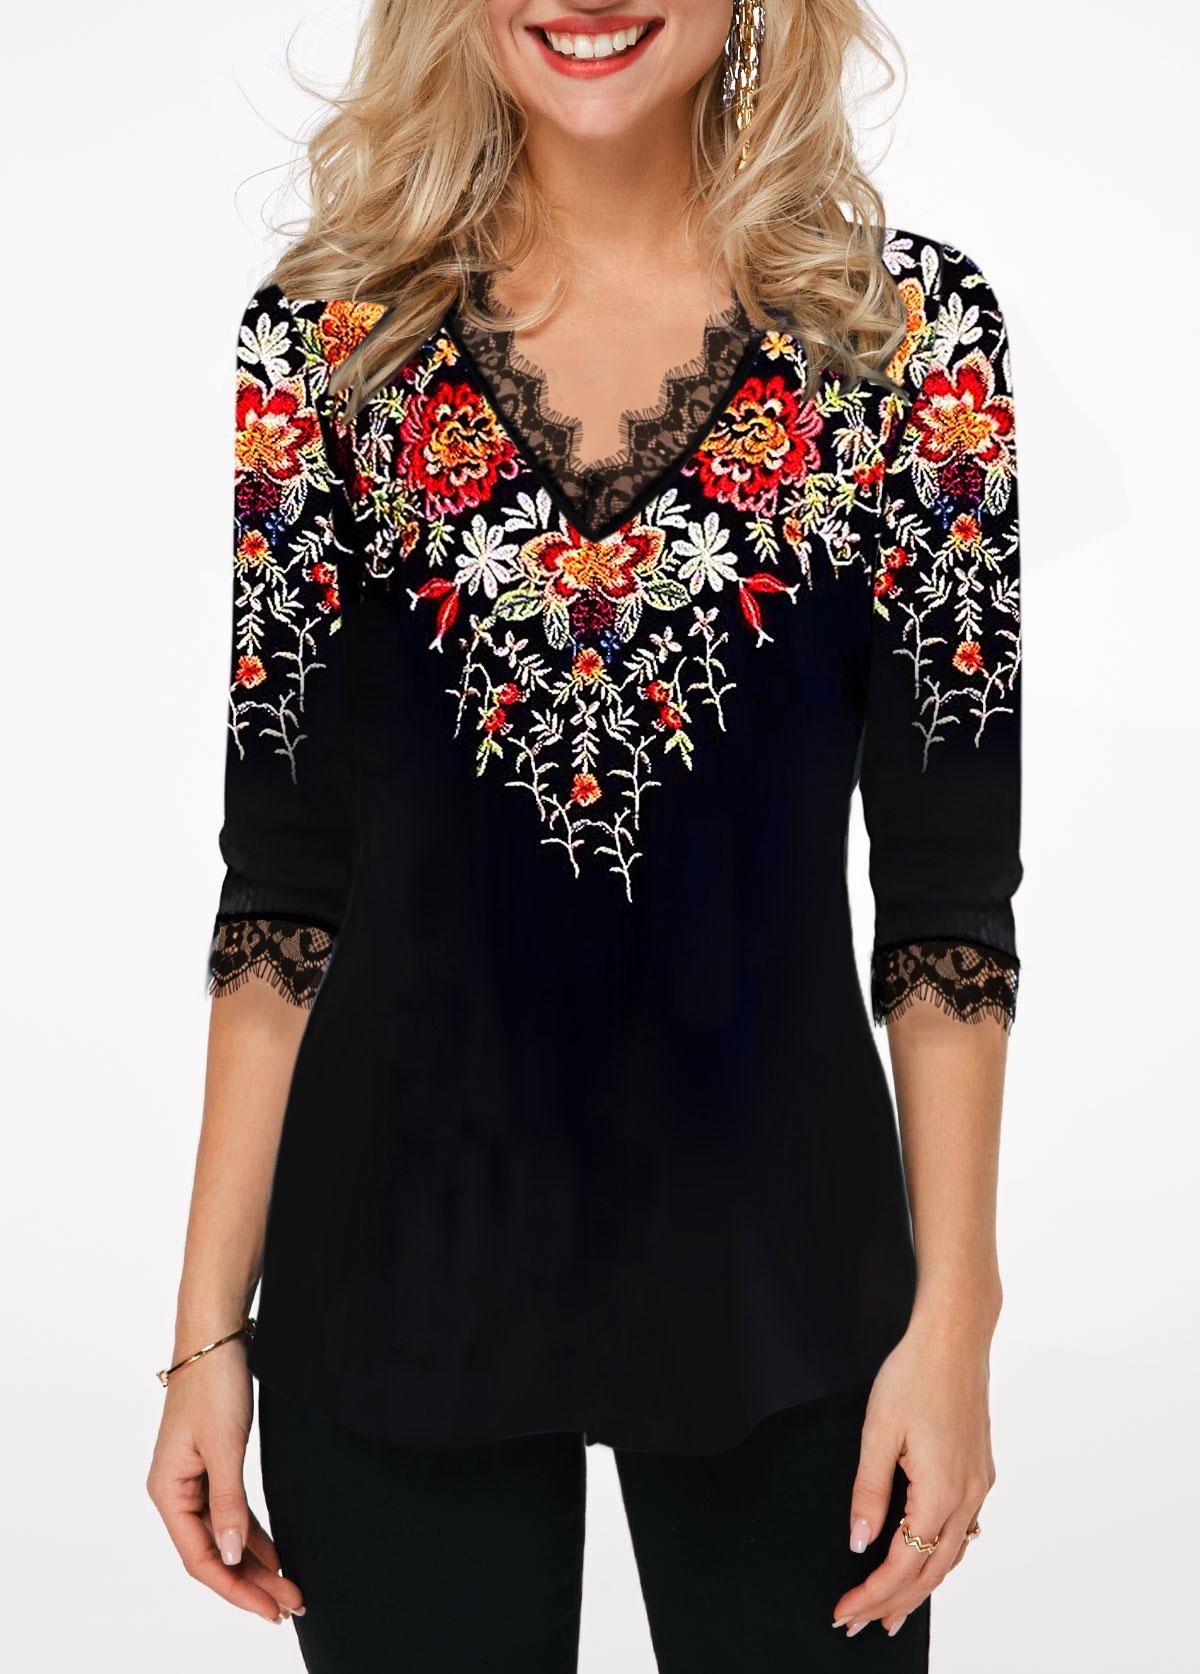 Floral Print Three Quarter Sleeve Lace Patchwork T Shirt